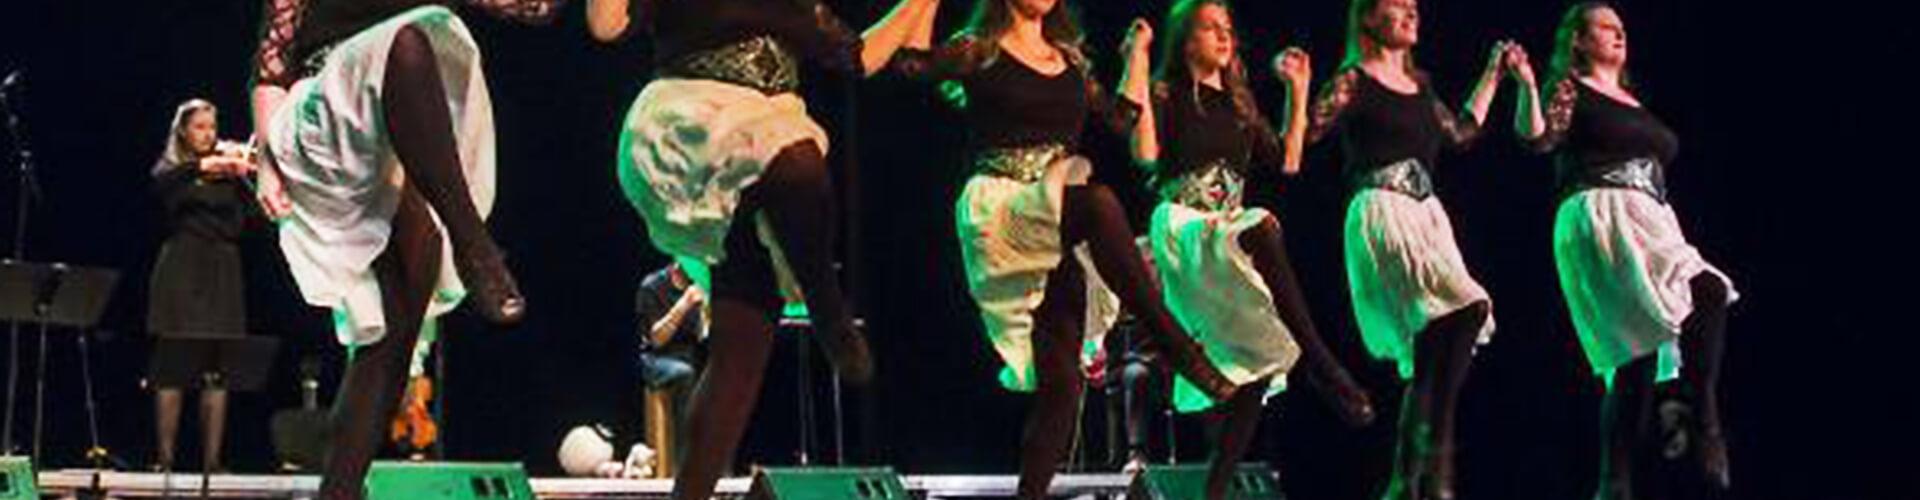 image-centrale-danses-irlandaises_B